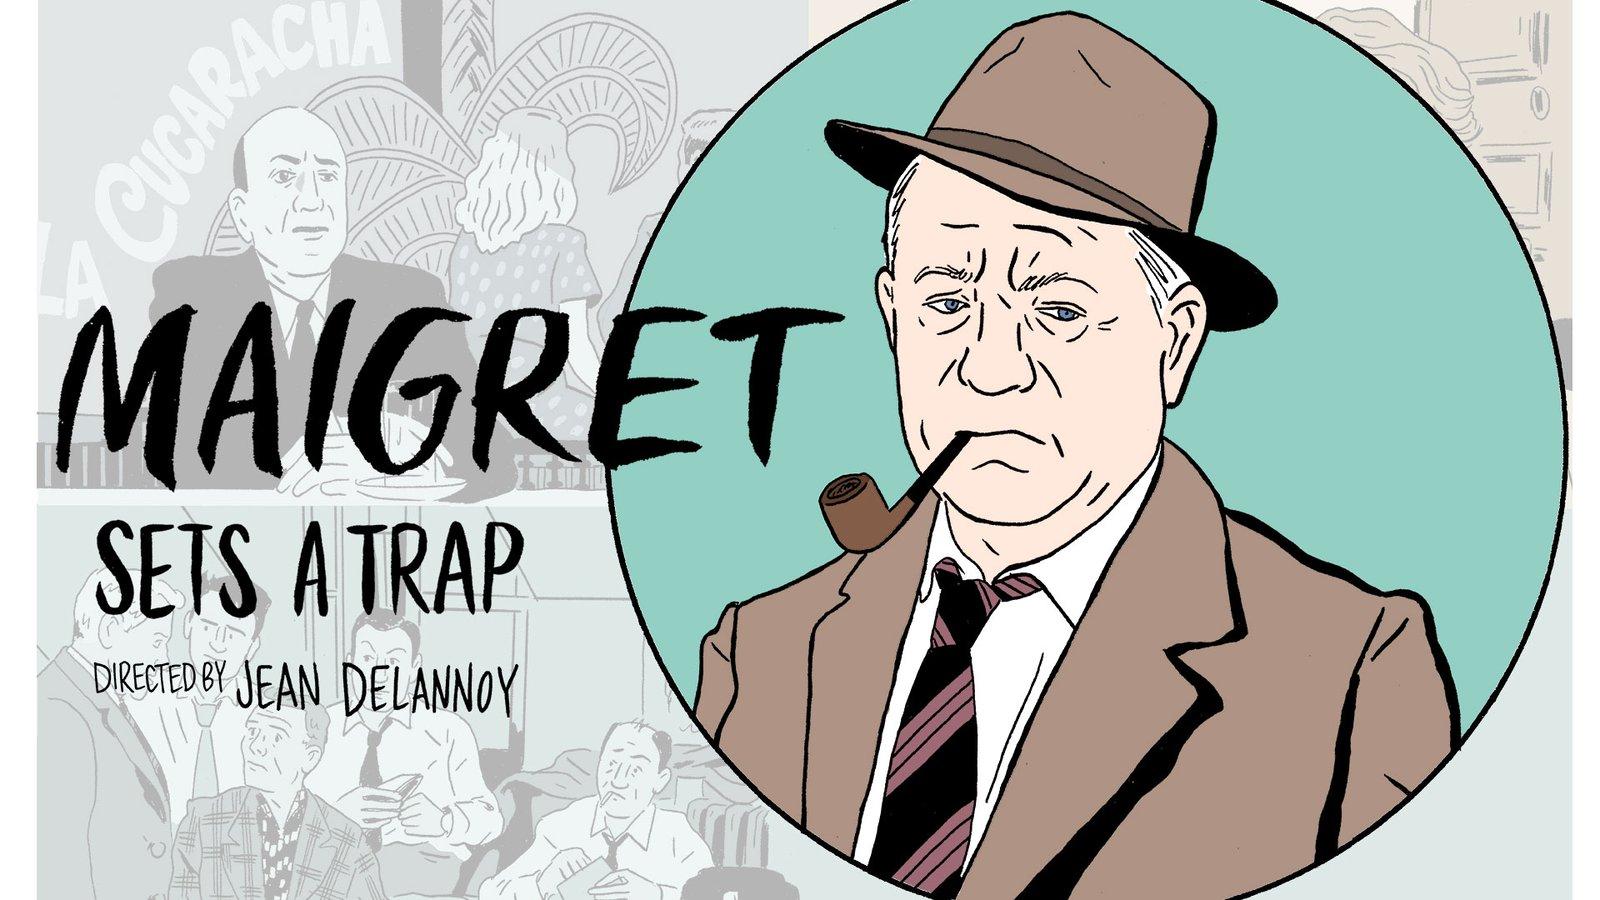 Maigret Sets a Trap - Maigret tend un piège